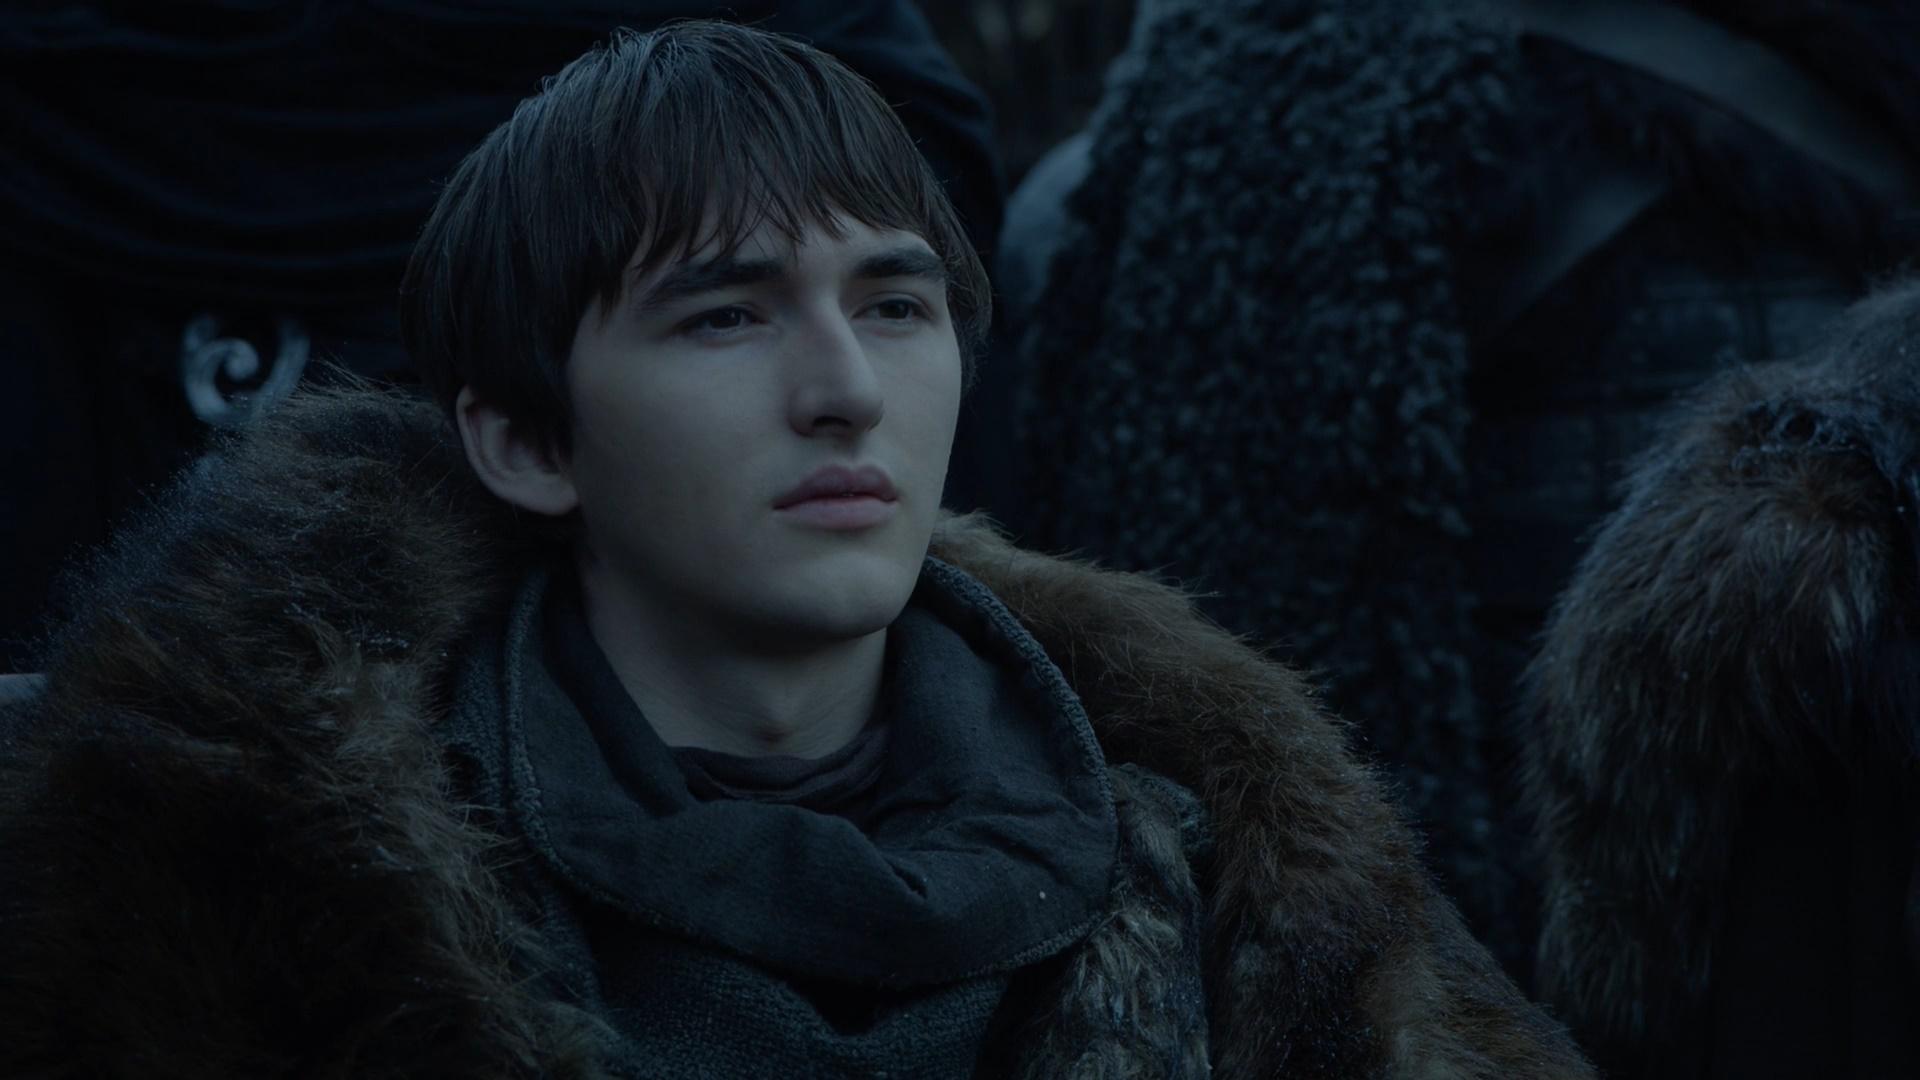 Bran Stark Stare | Know Your Meme